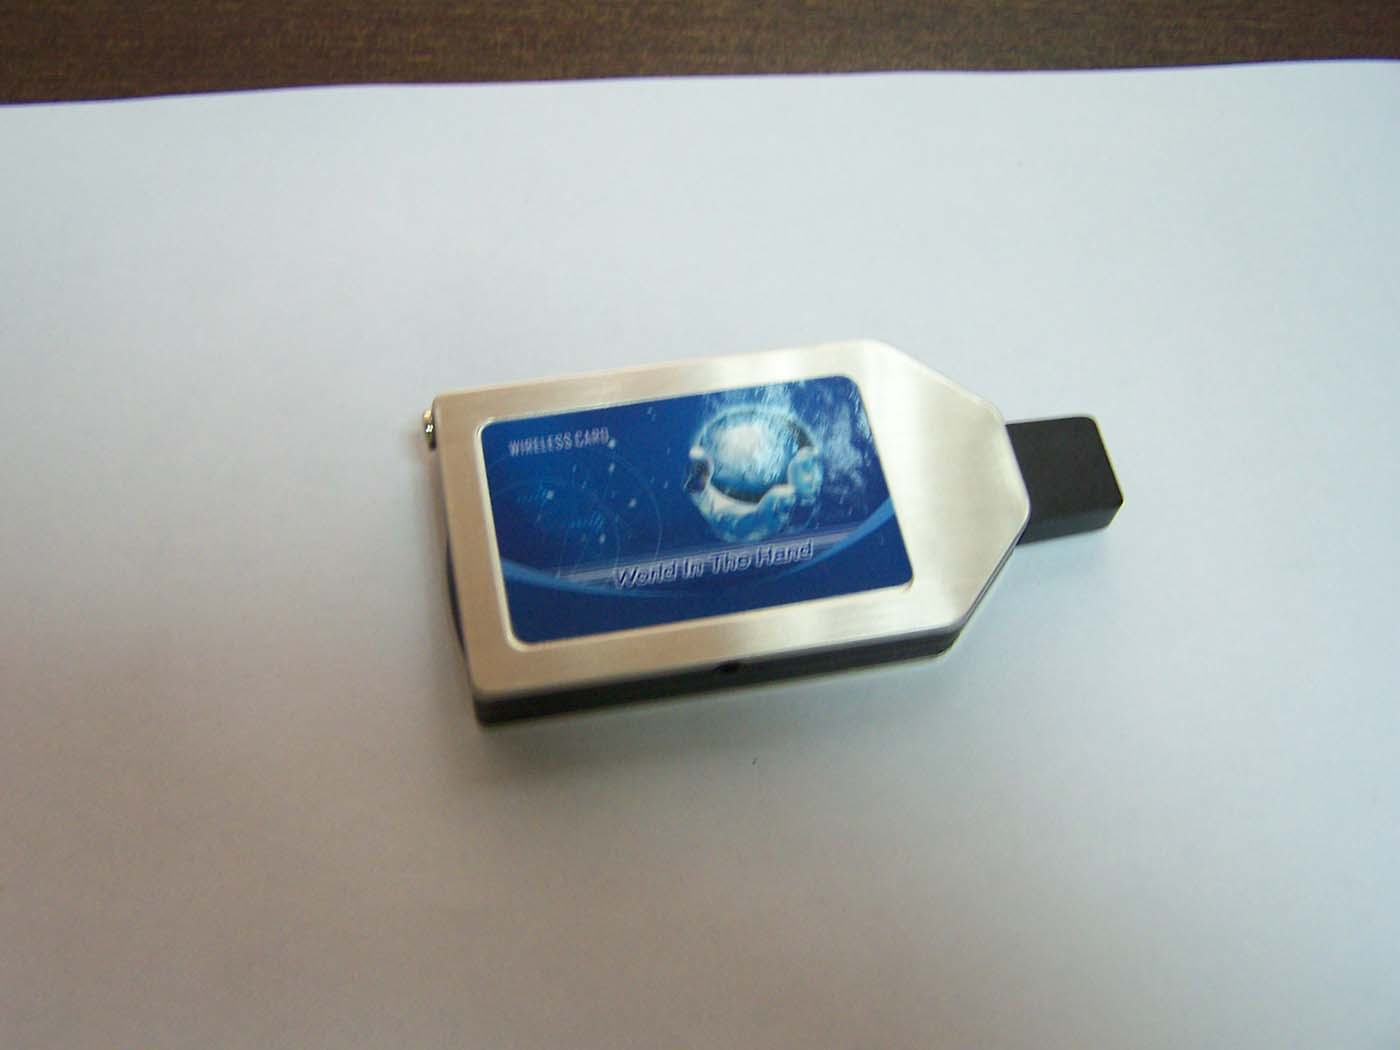 GPRS / EDGE / EVDO / UMTS USB & PCMCIA Wireless Internet Modem